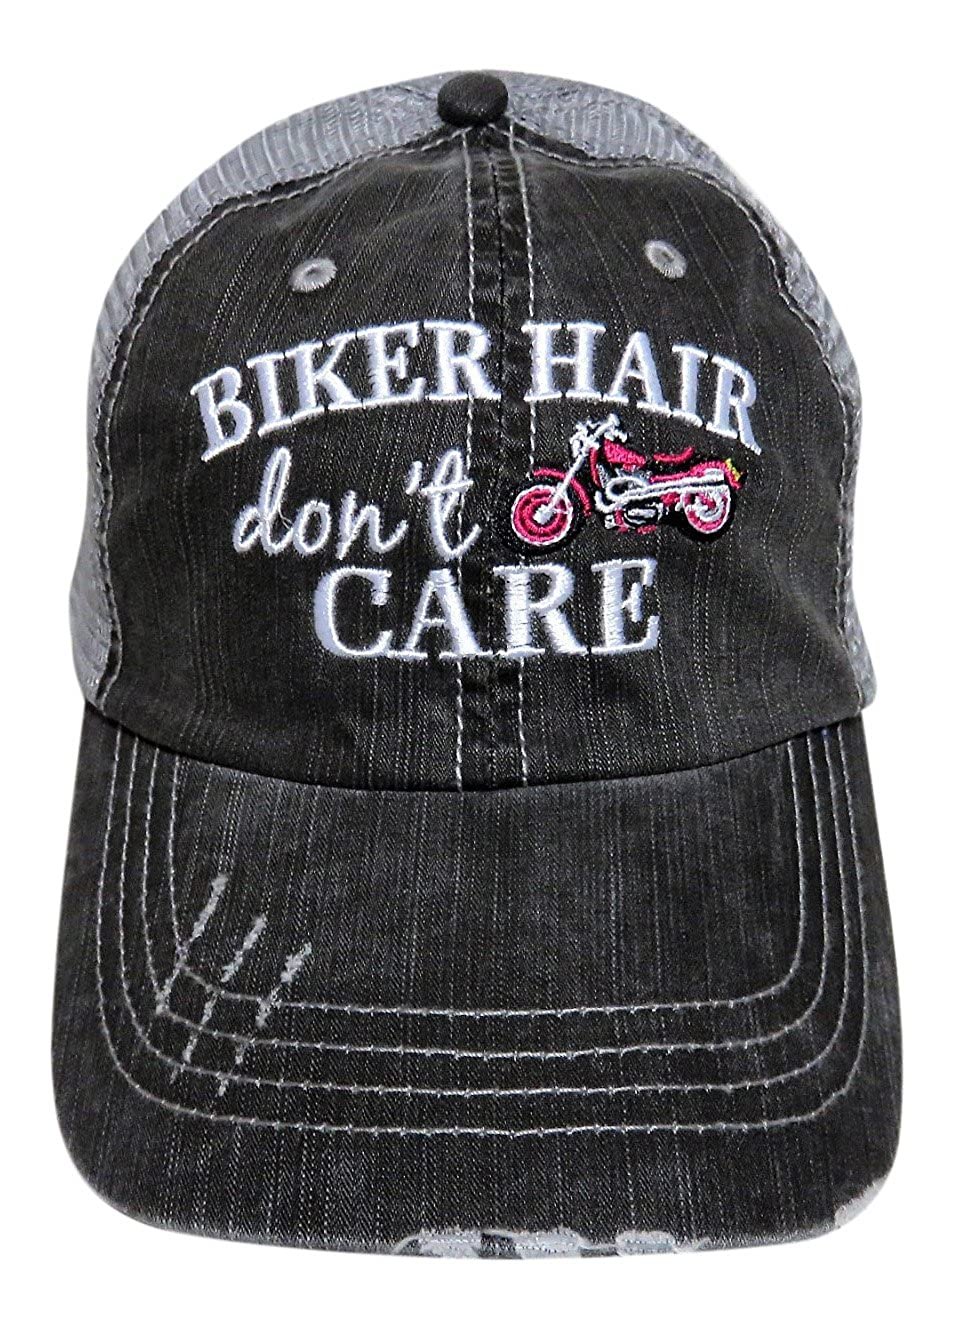 Embroidered Biker Hair Don't Care Grey Trucker Cap Hat